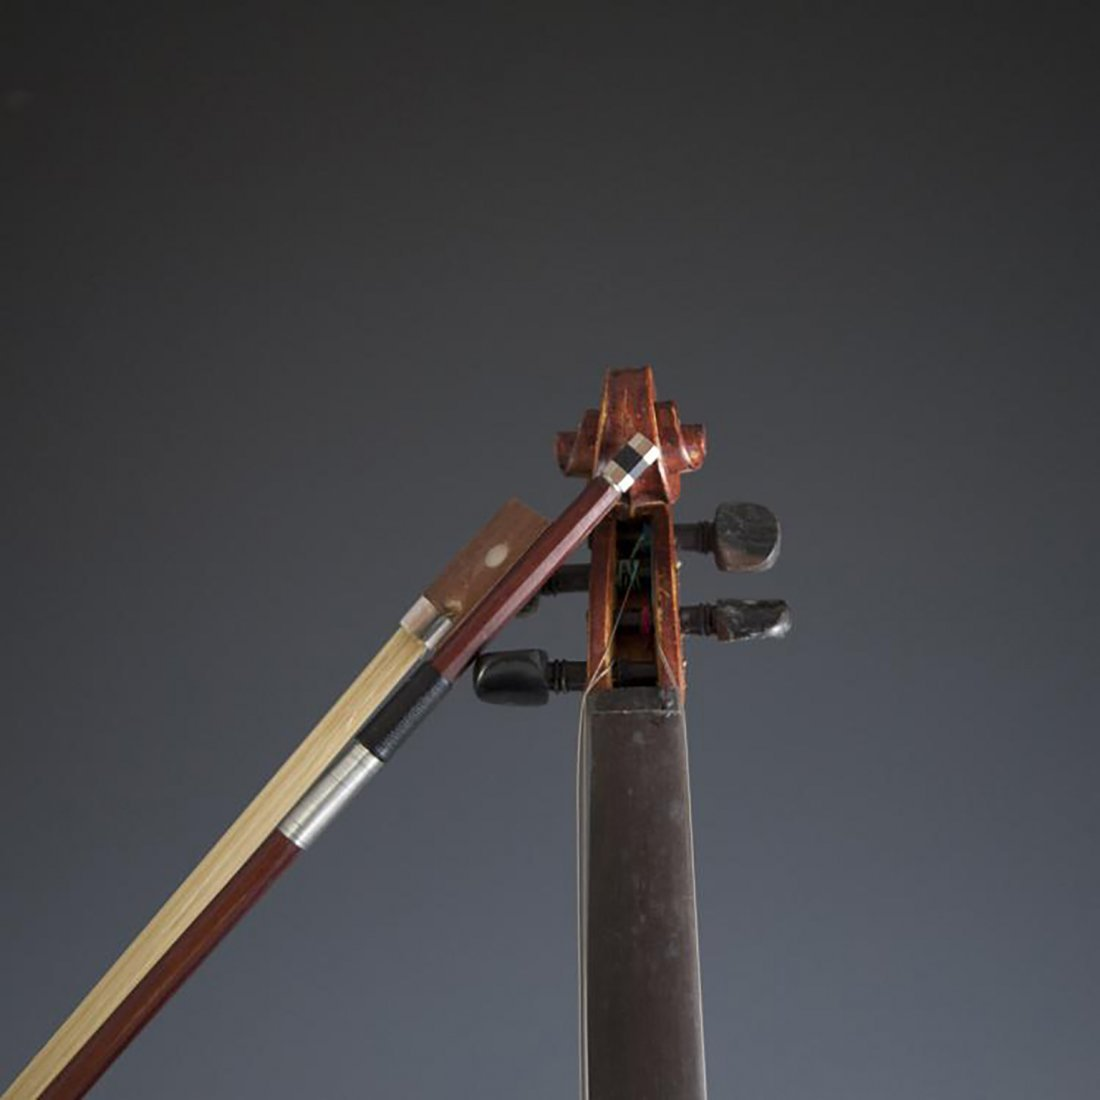 Continental Copy of a Stradivarius Violin - 4